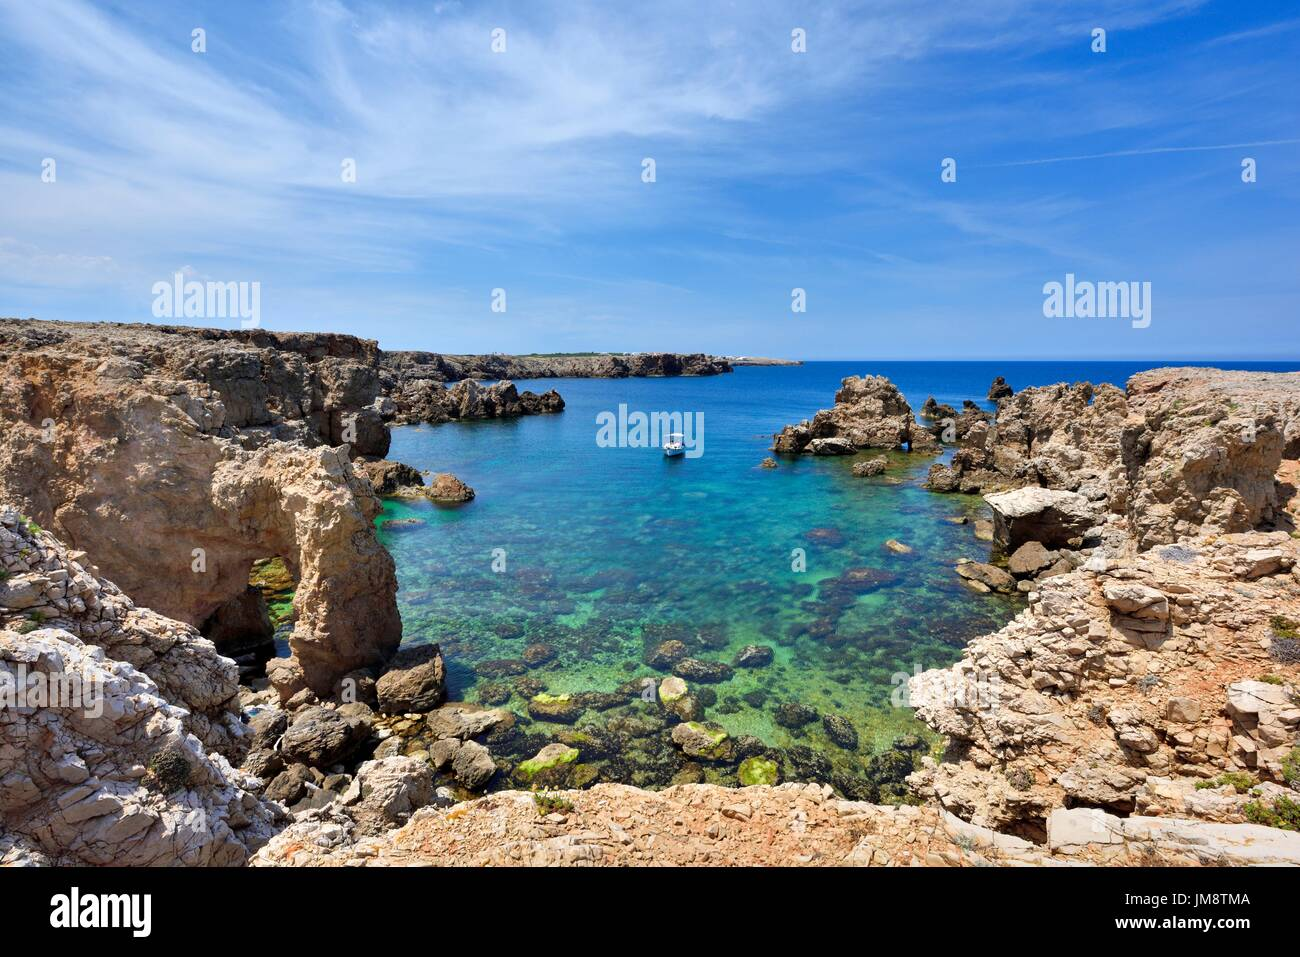 Punta des Nou Covus Na Macaret Menorca Minorca Spain - Stock Image